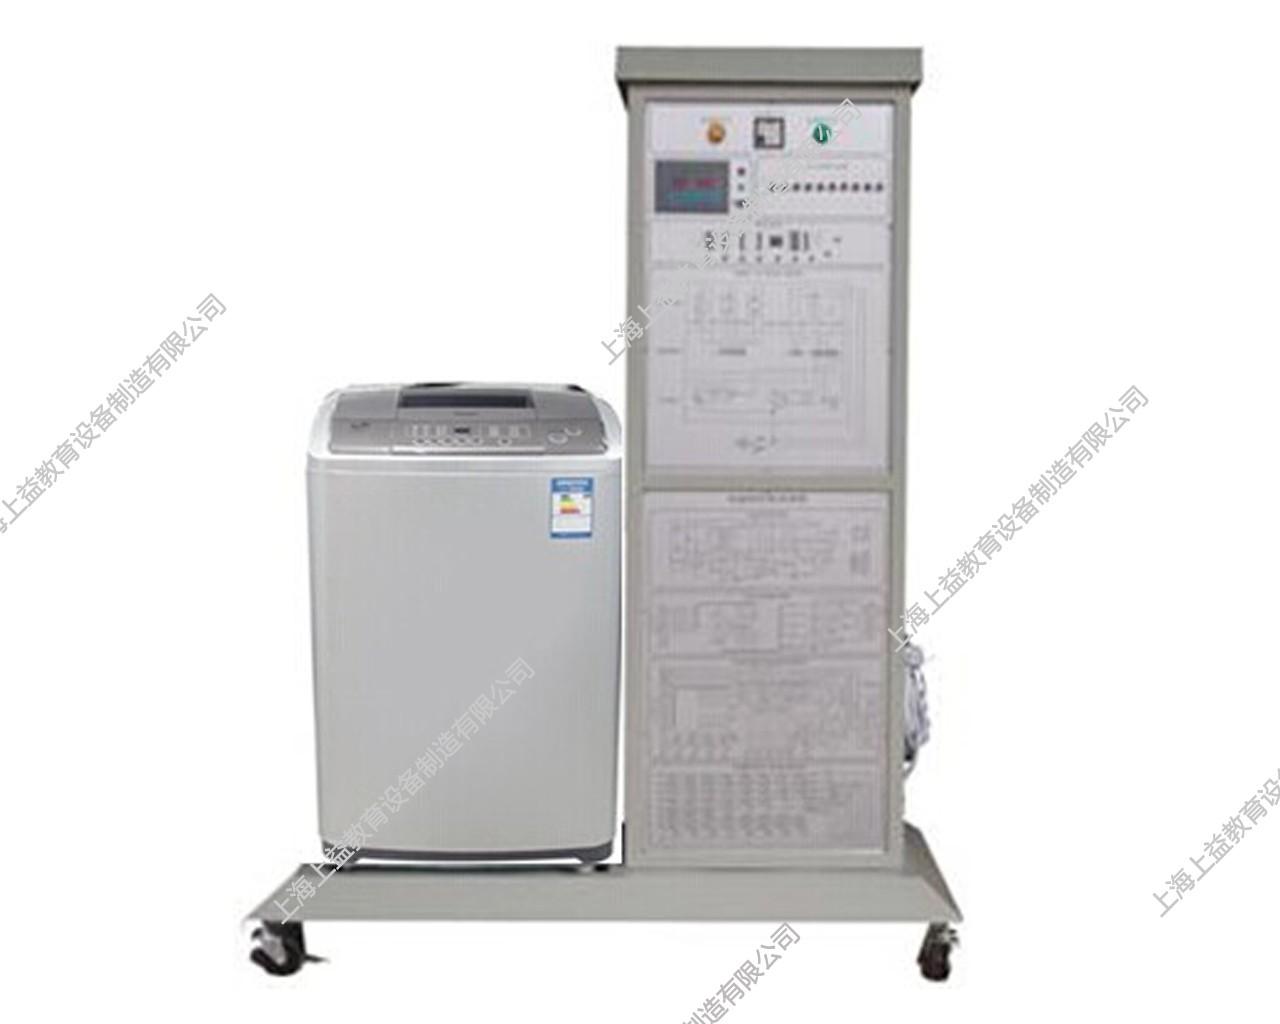 SYJYD-B5型 波轮式洗衣机维修技能wwwlehu8viplehu68vip装置